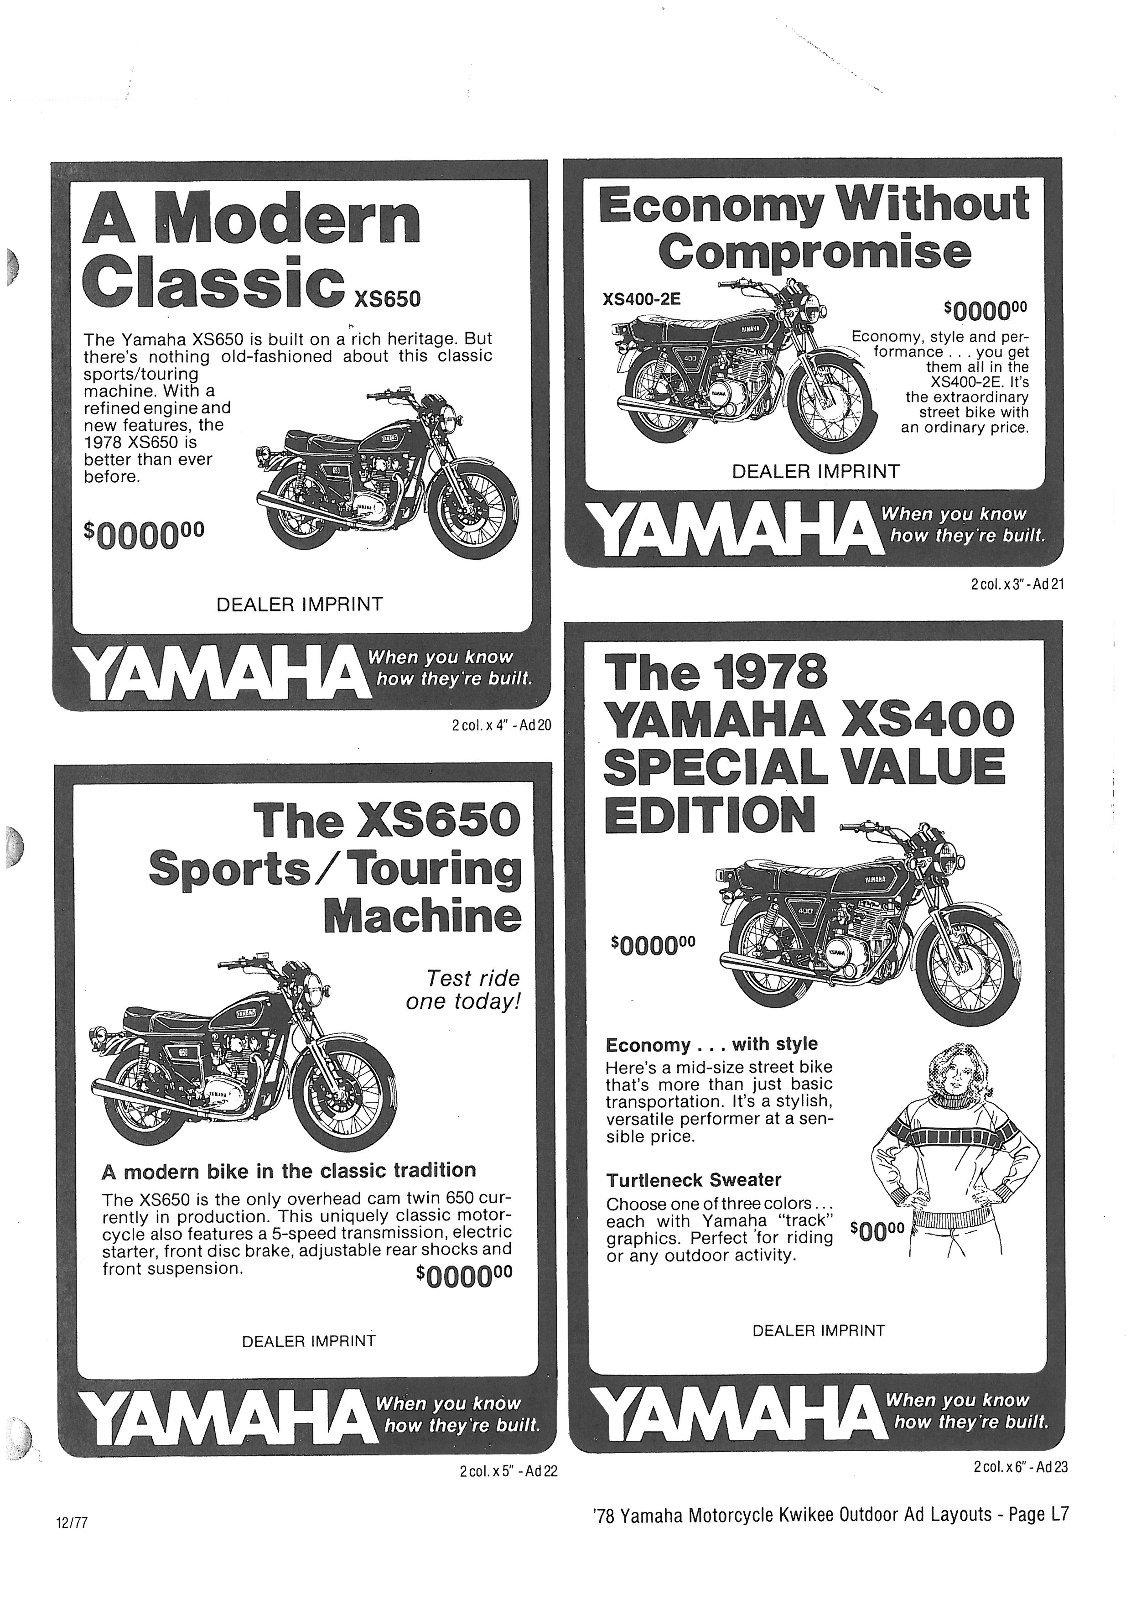 Yamaha Xs400 2e Wiring Diagram Yamaha Sr500 Wiring Diagram